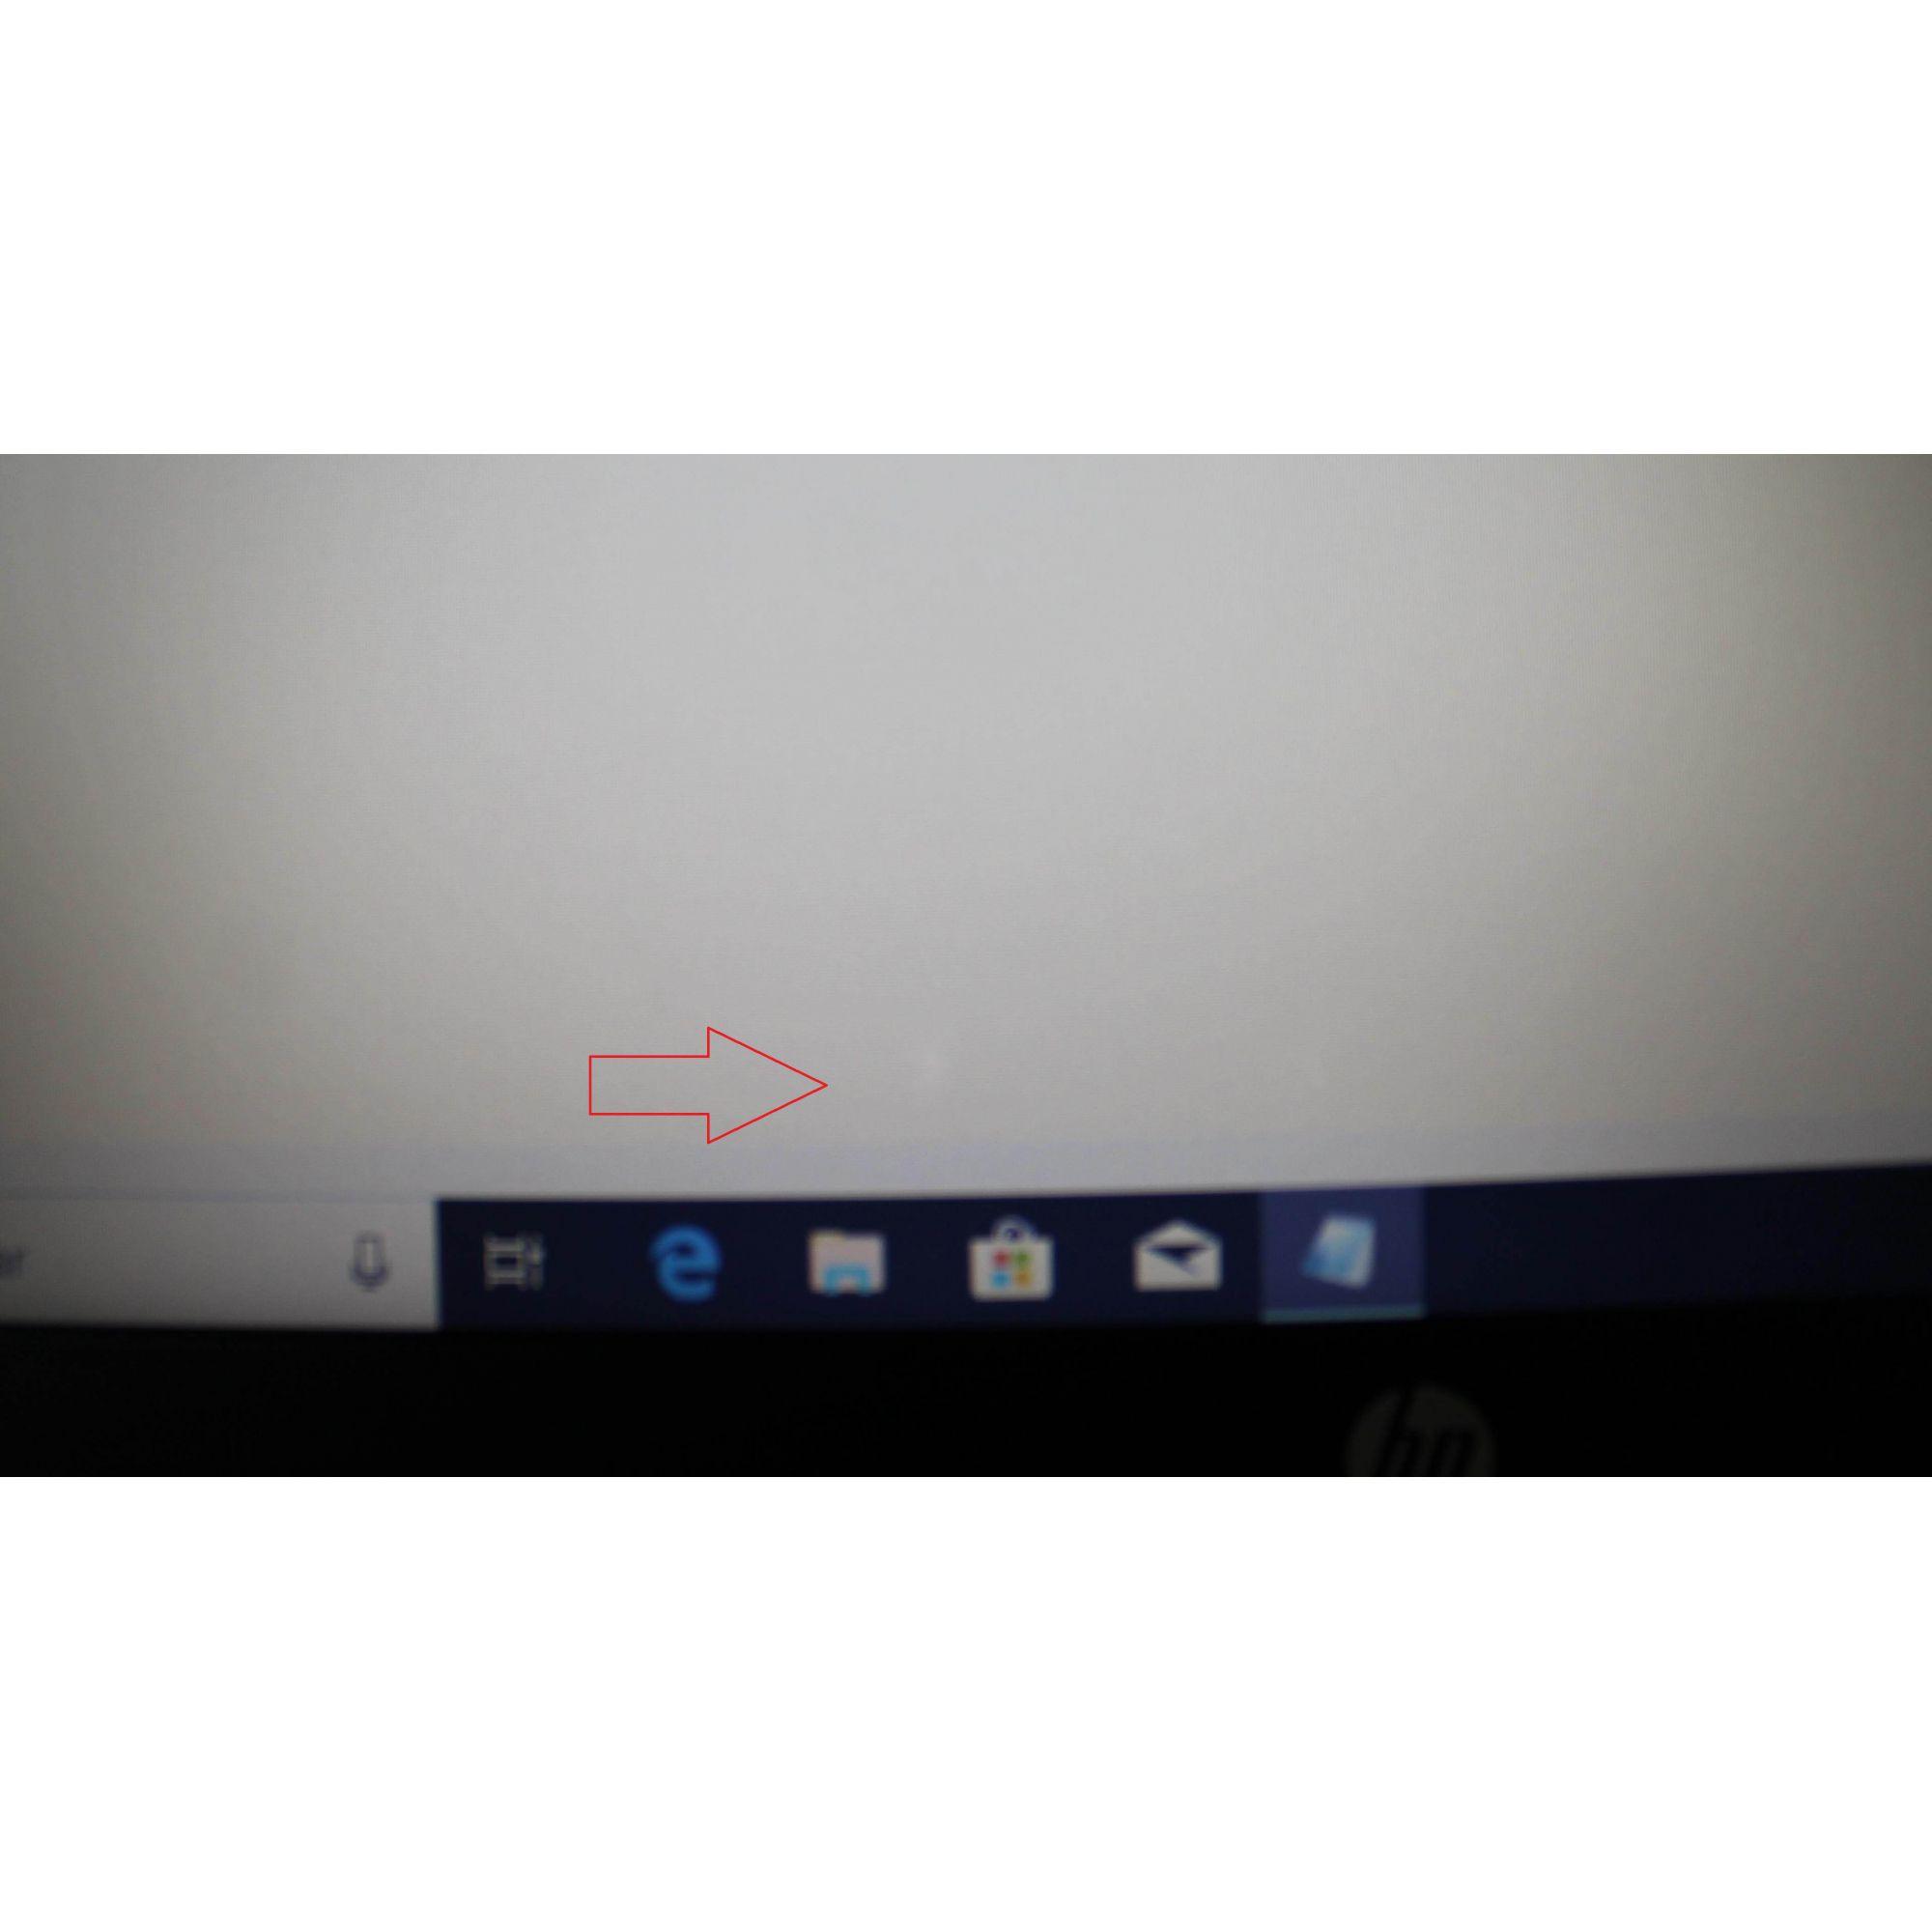 "Notebook HP EliteBook 840 G1 14"" Intel Core i5 1.90GHz 8GB SSD-128GB"